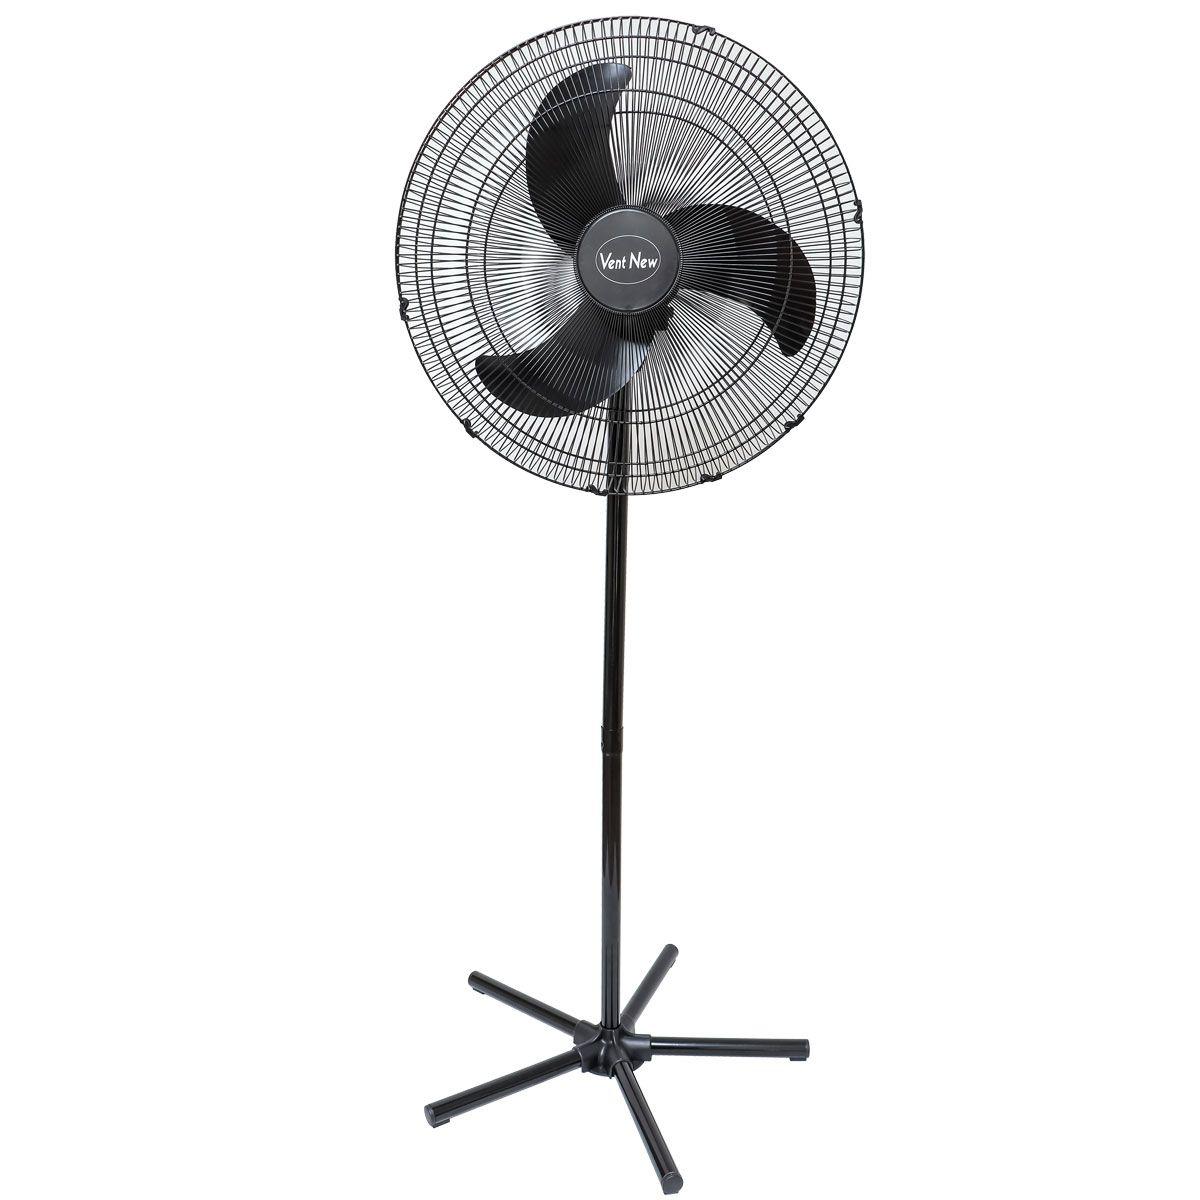 Ventilador De Coluna Oscilante 60 Cm Preto Bivolt